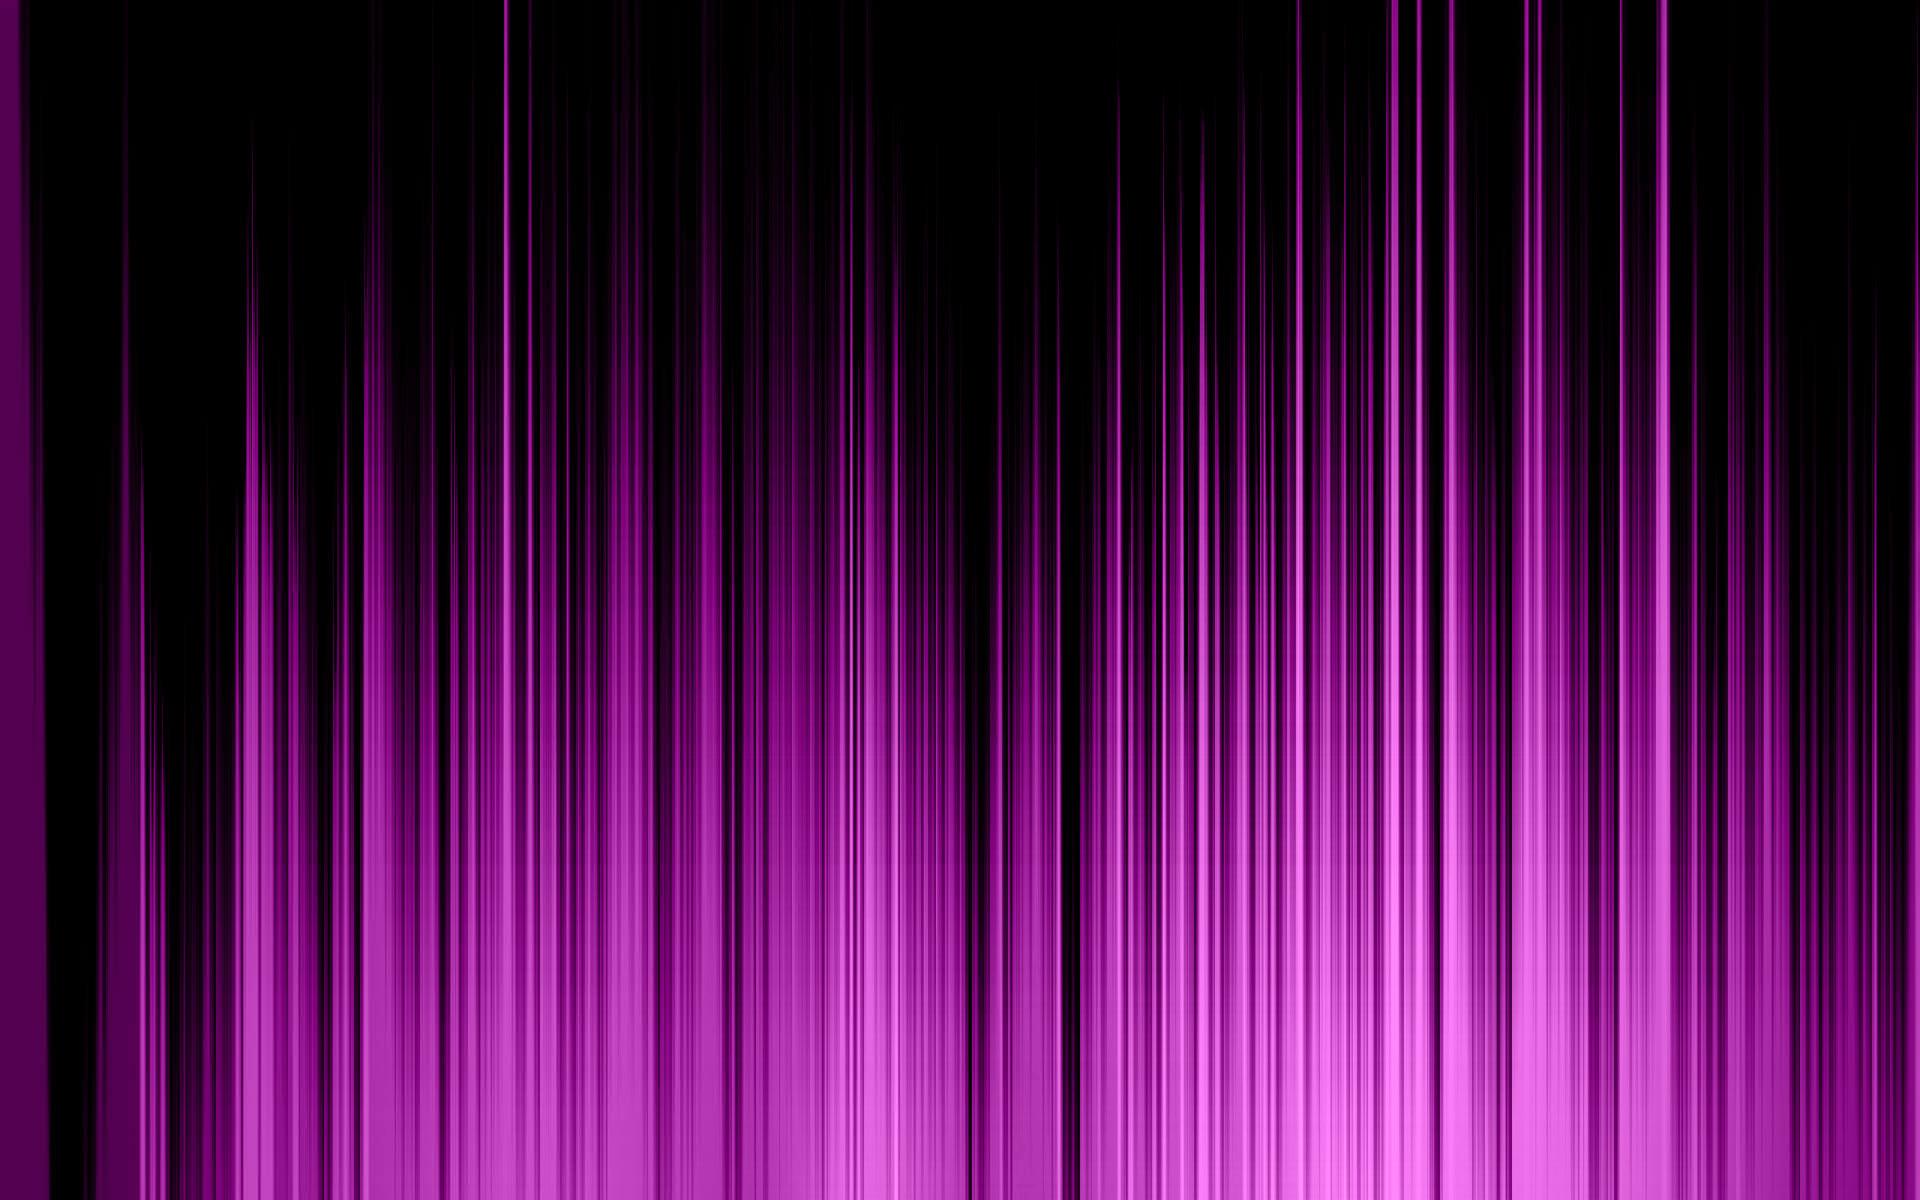 Purple Curtains Background By TheMachineSucker Purple Curtains Background  By TheMachineSucker